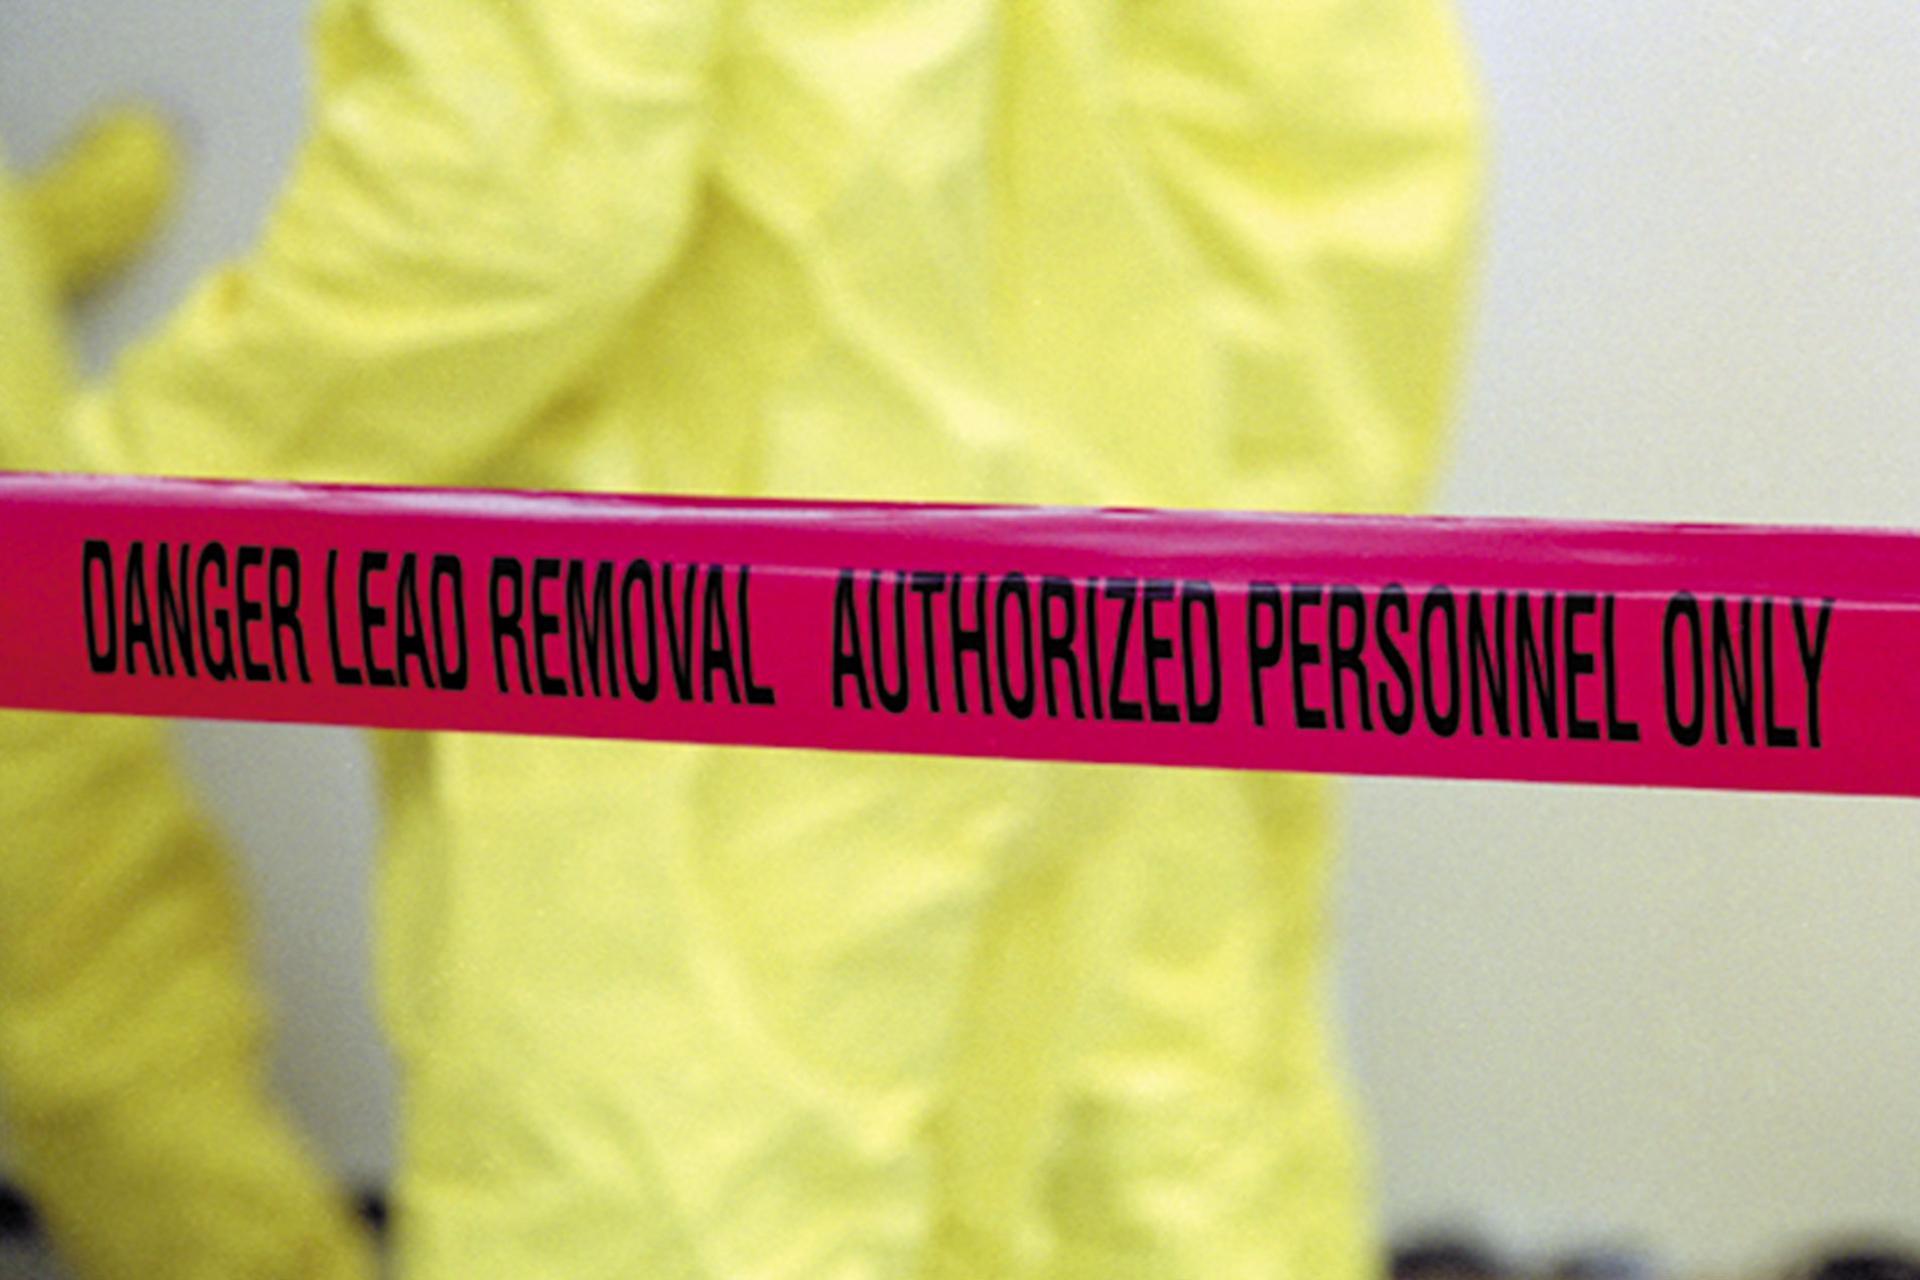 Dangerous lead removal tape